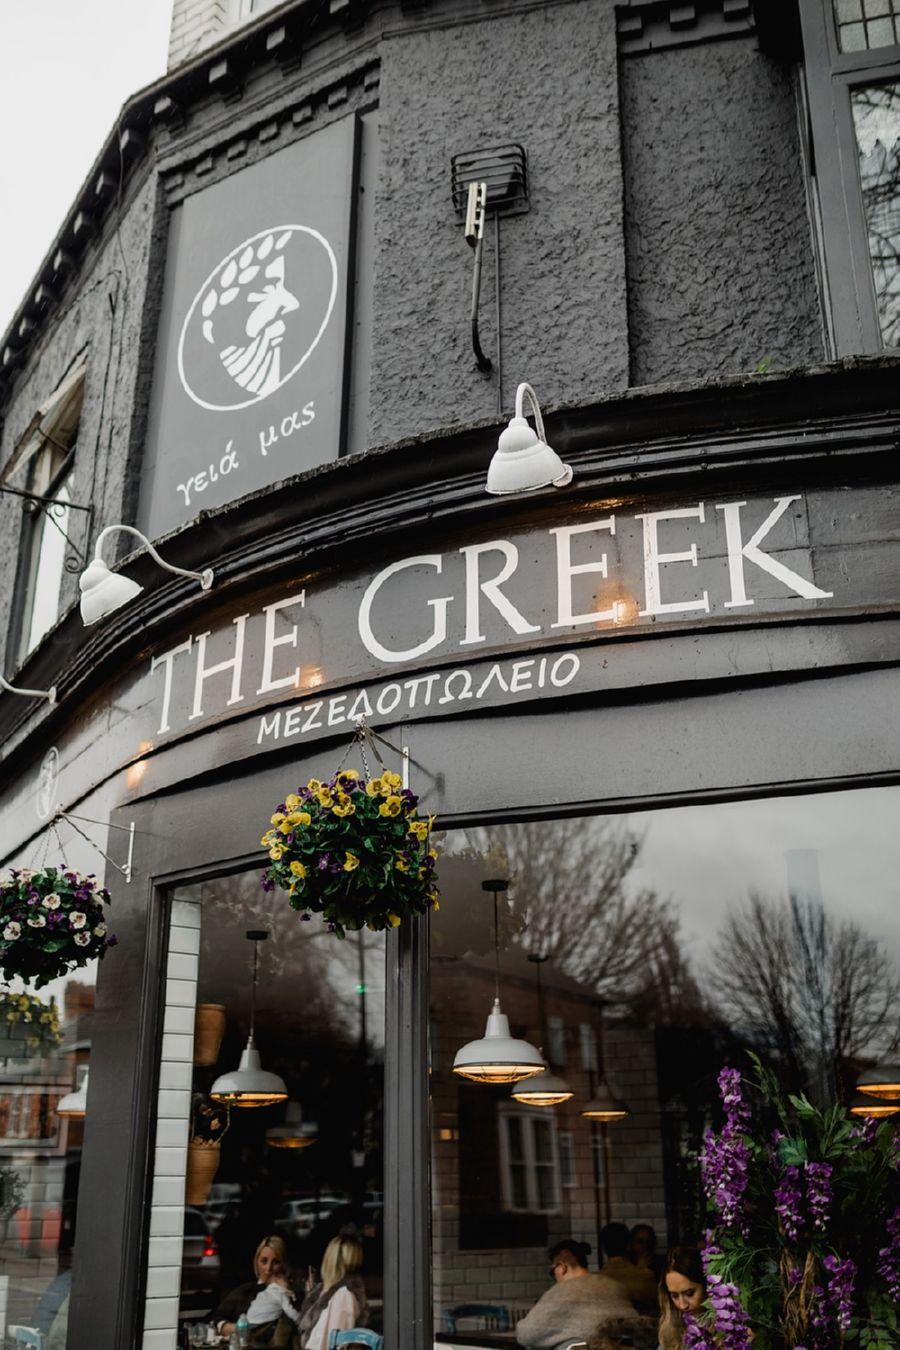 Many popular Greek restaurants use Greek words in the names